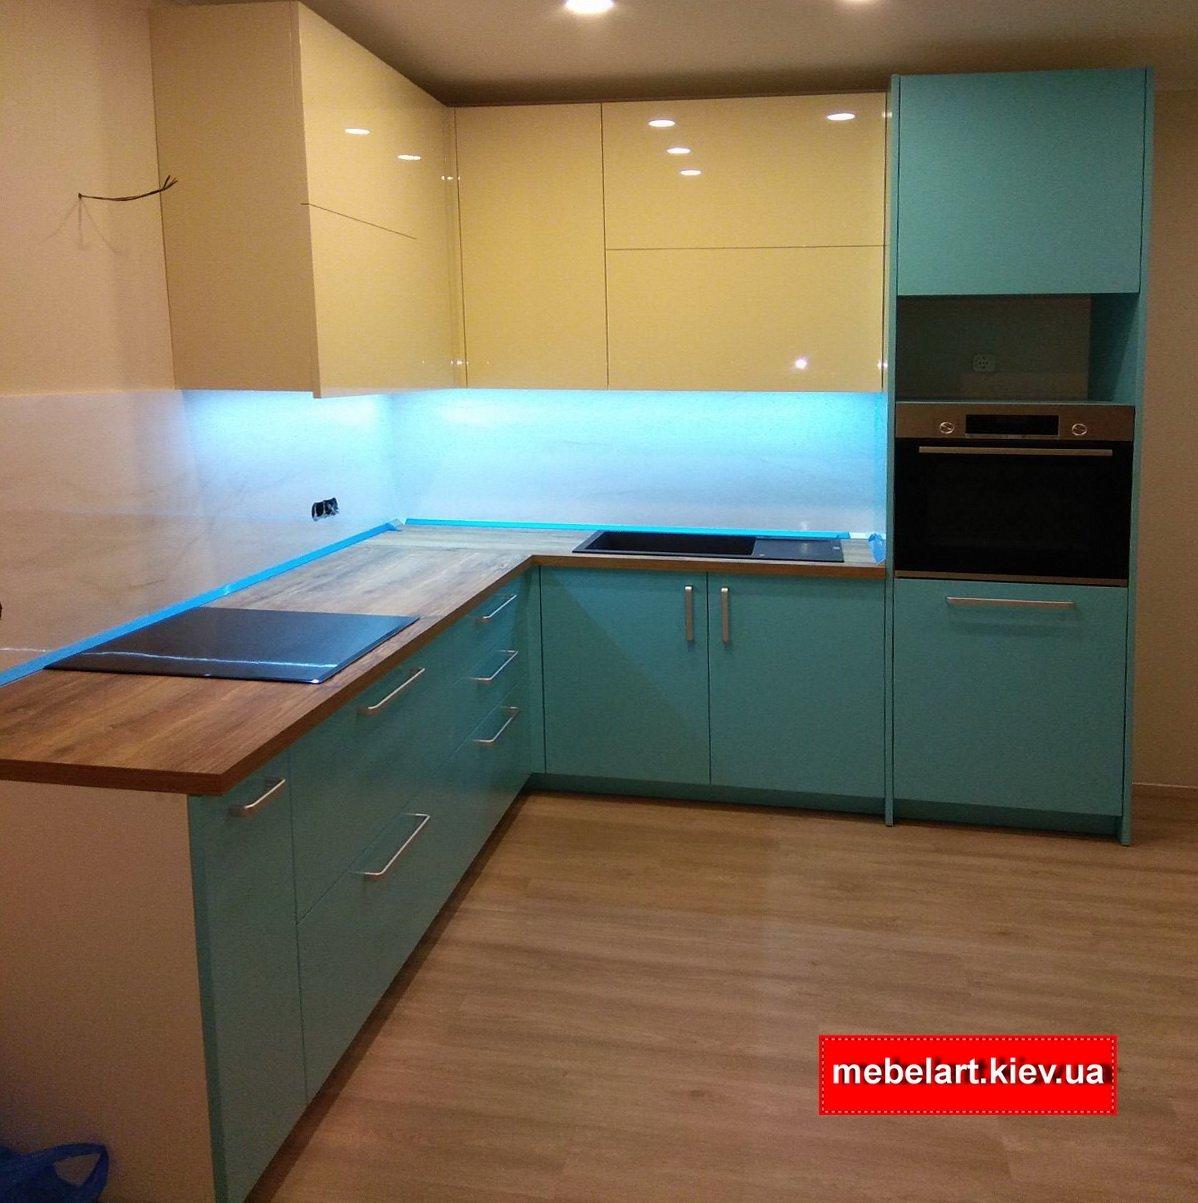 кухня зеленого цвета МДФ